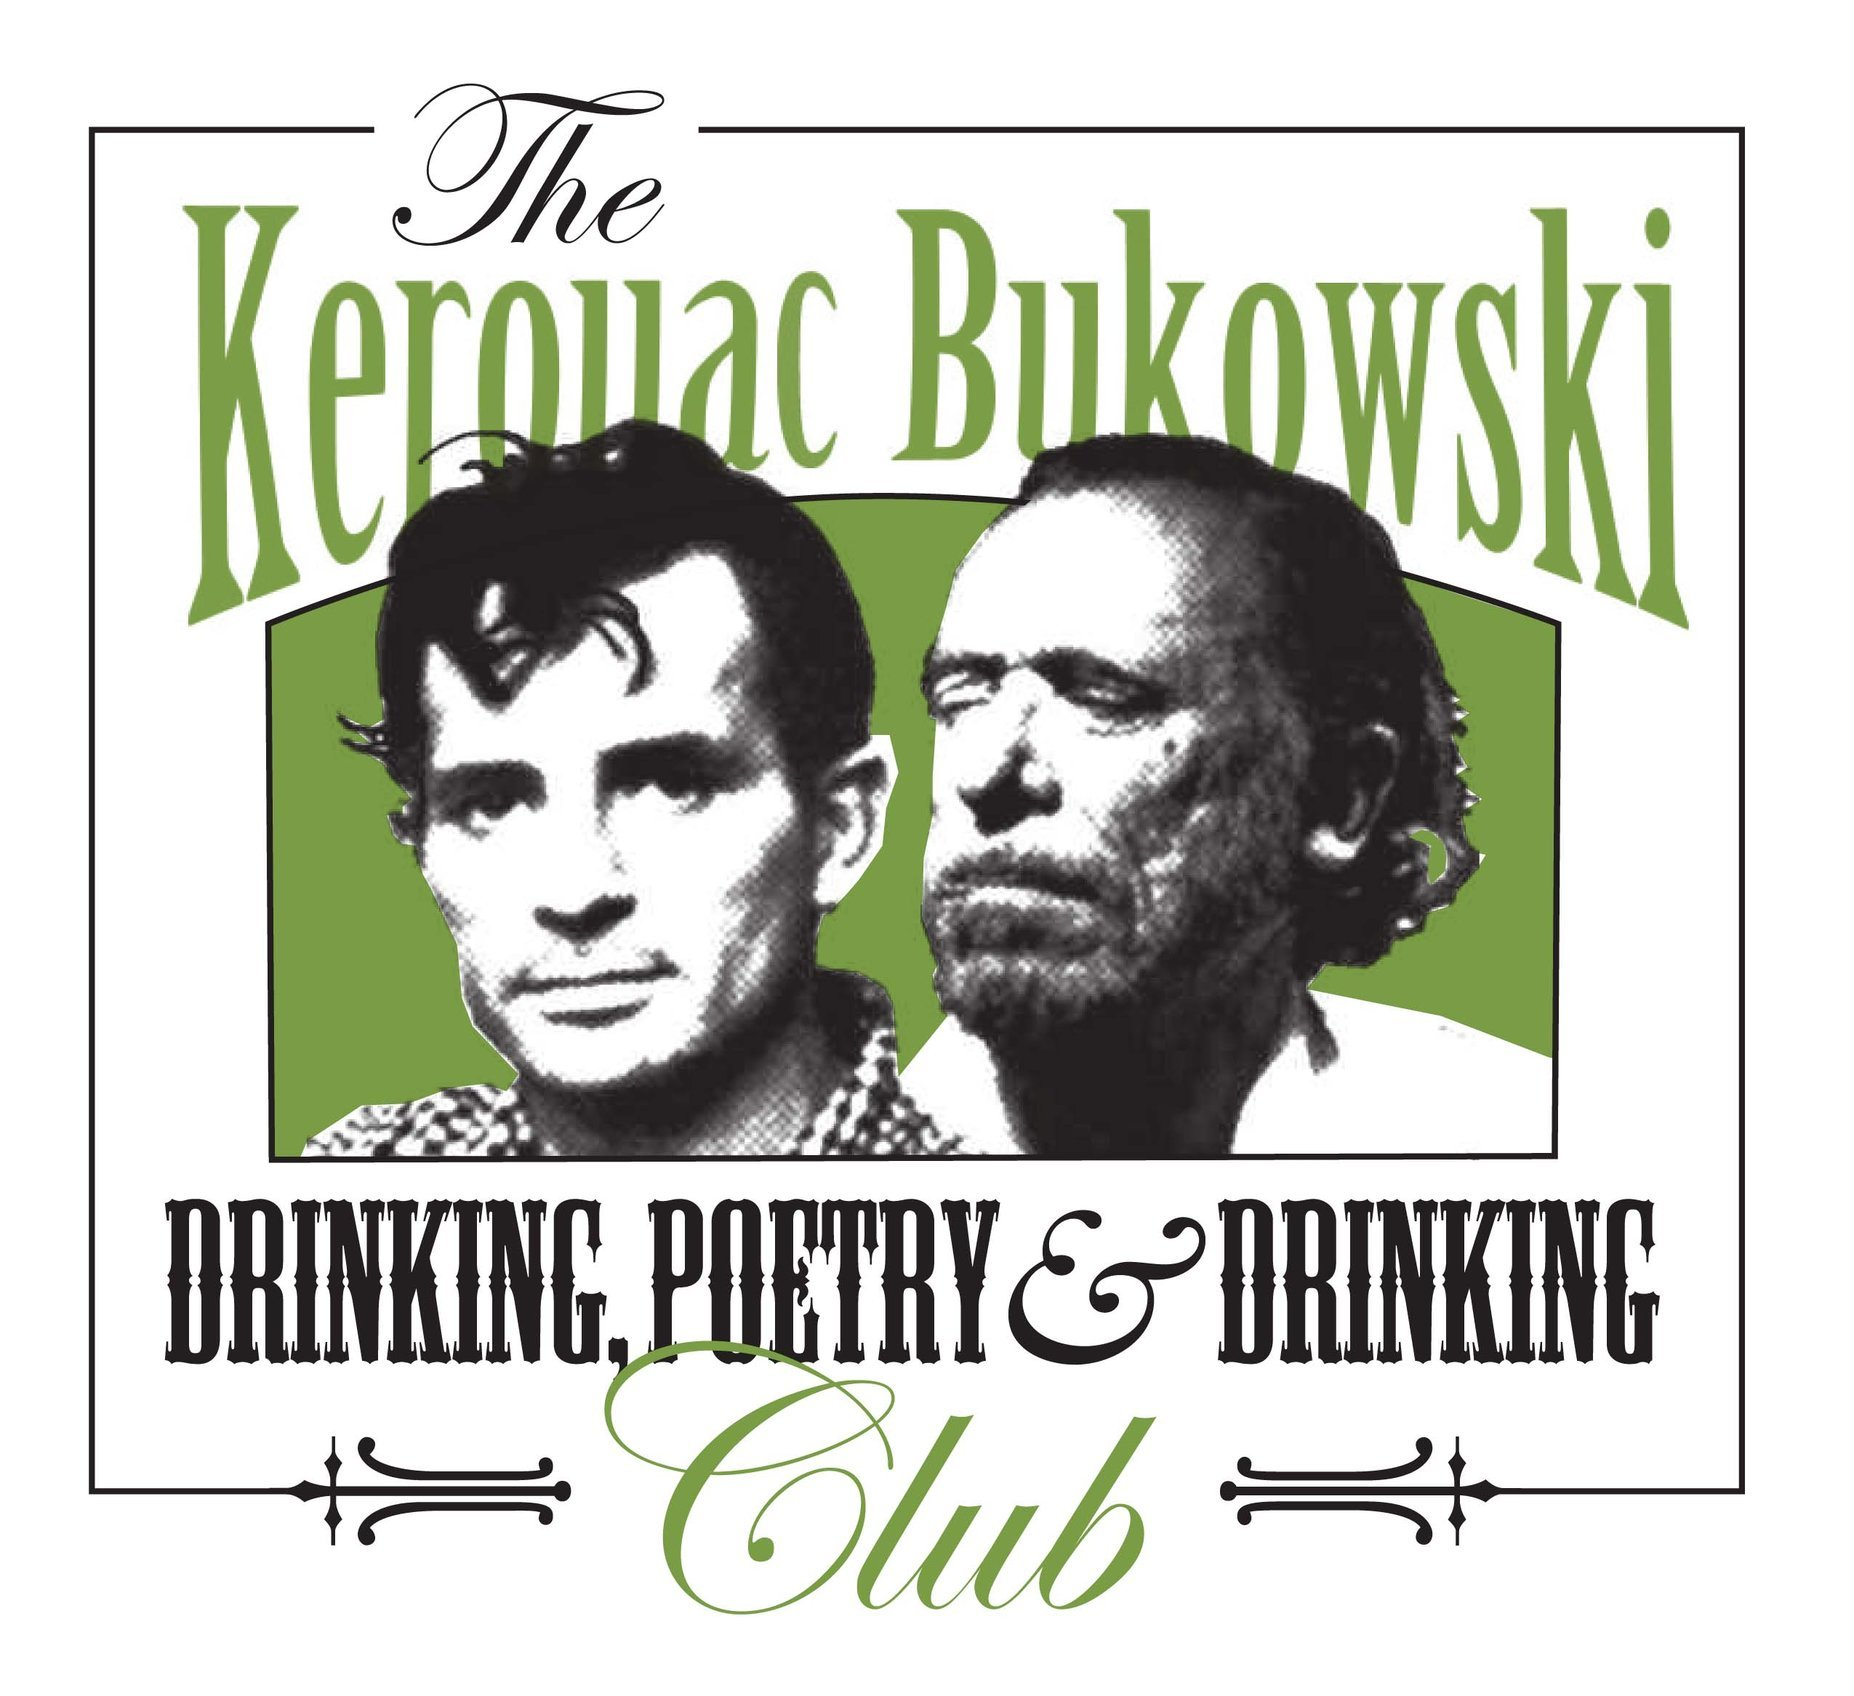 Kerouac Bukowski Drinking, Poetry & Drinking logo.jpg